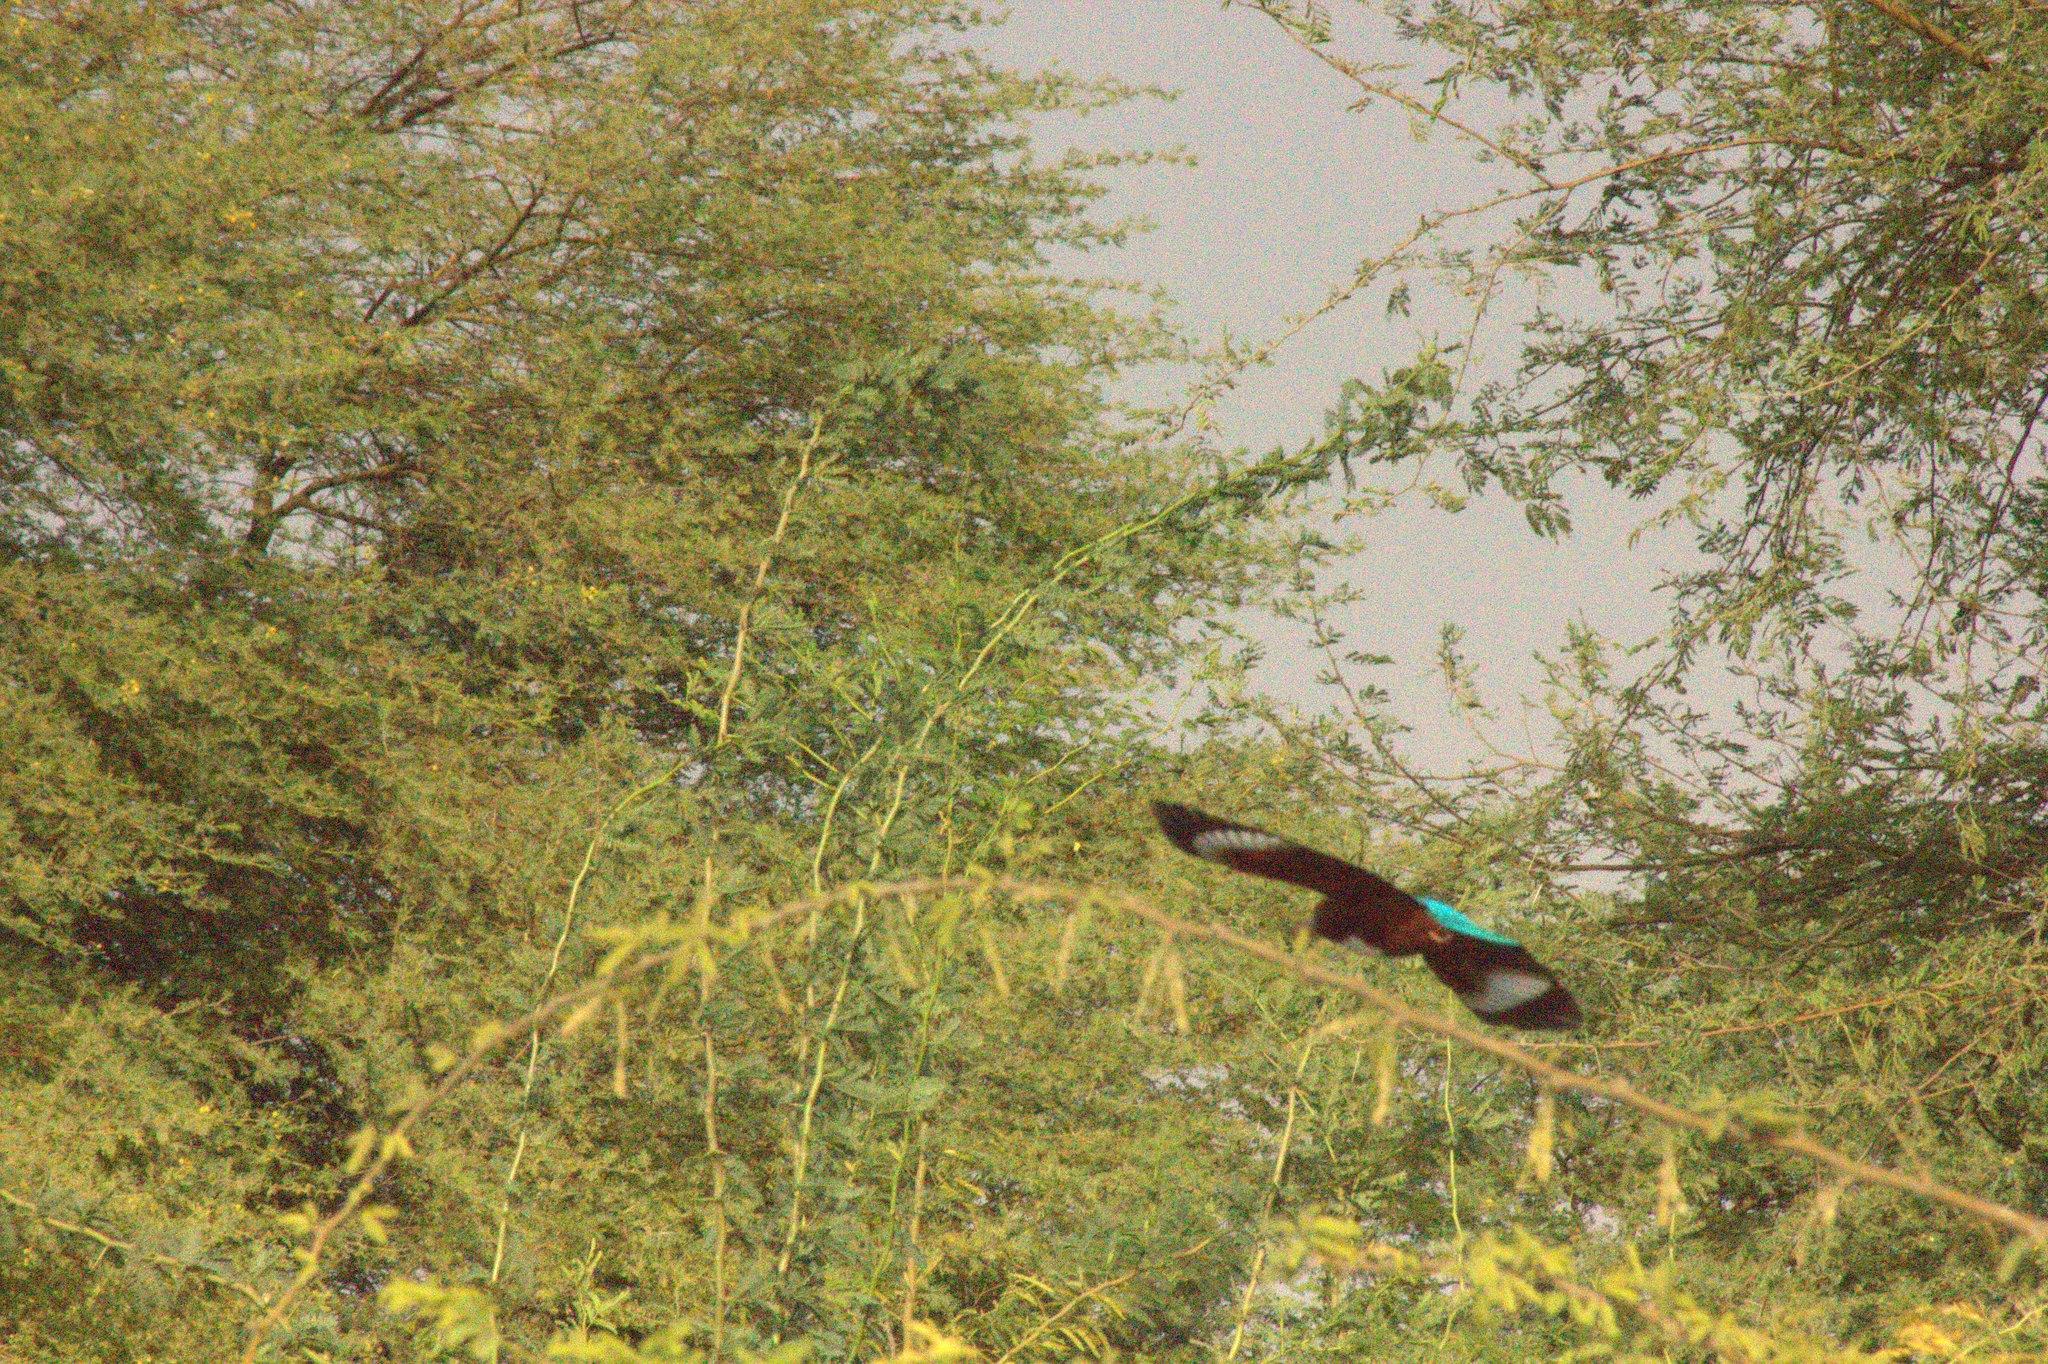 Kingfisher flies over Salawas village